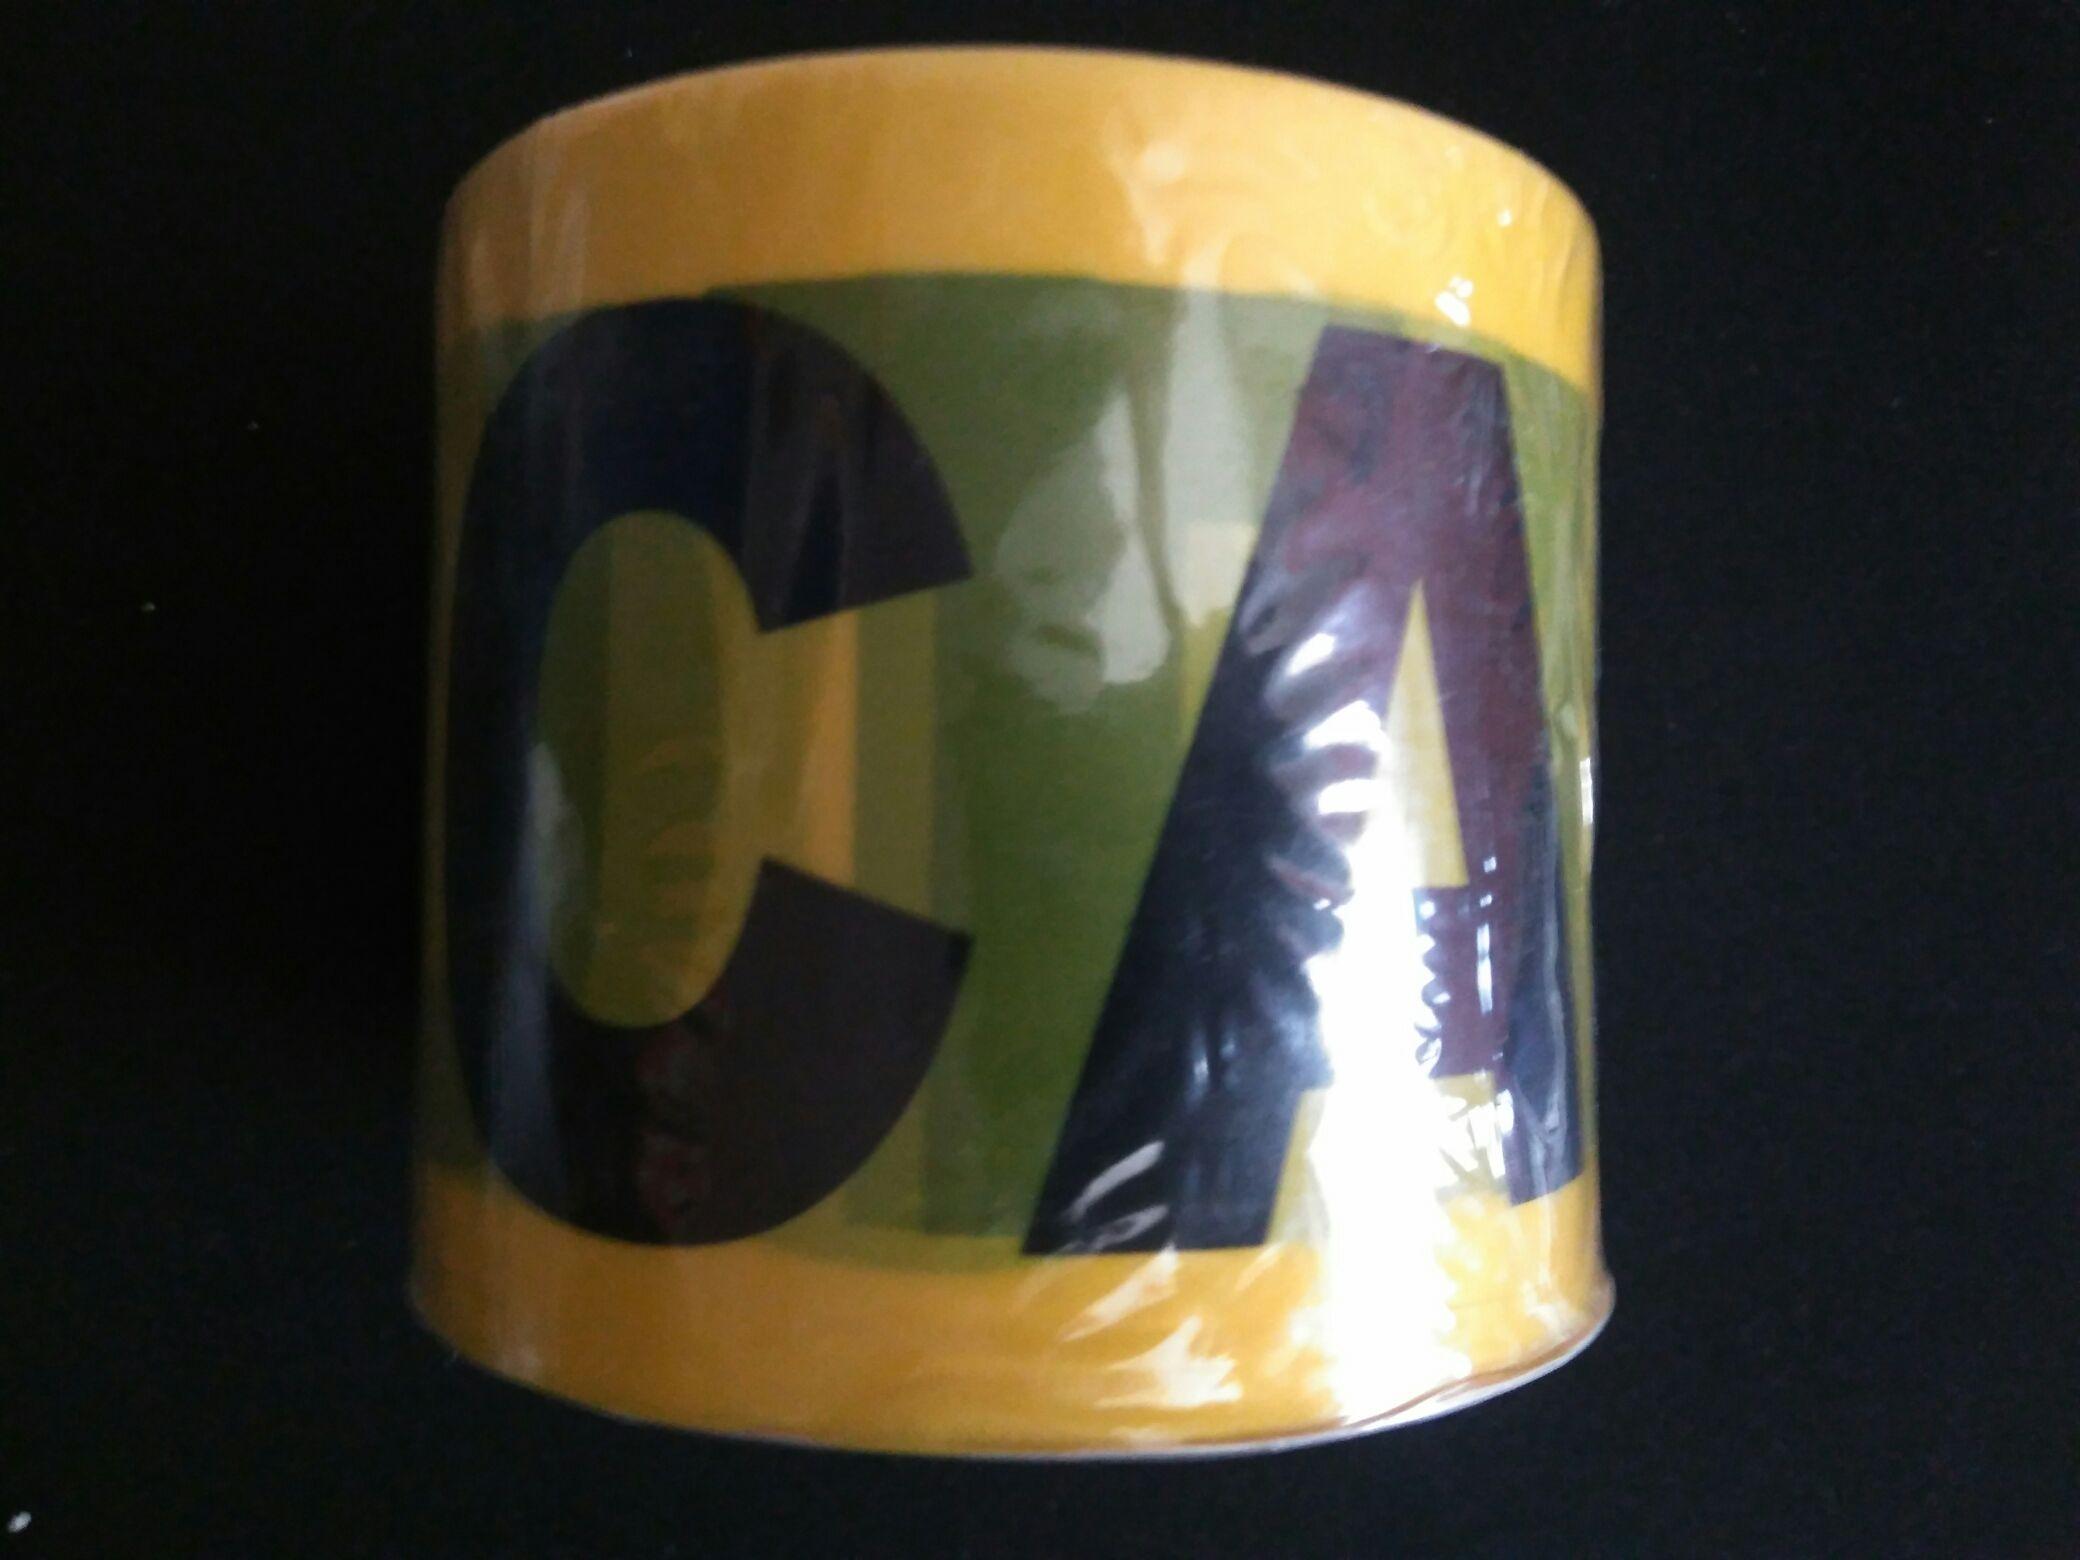 Chedraui: Cinta plástica de PRECAUCIÓNen $5.4, + Coca Cola de 600ml en $10.